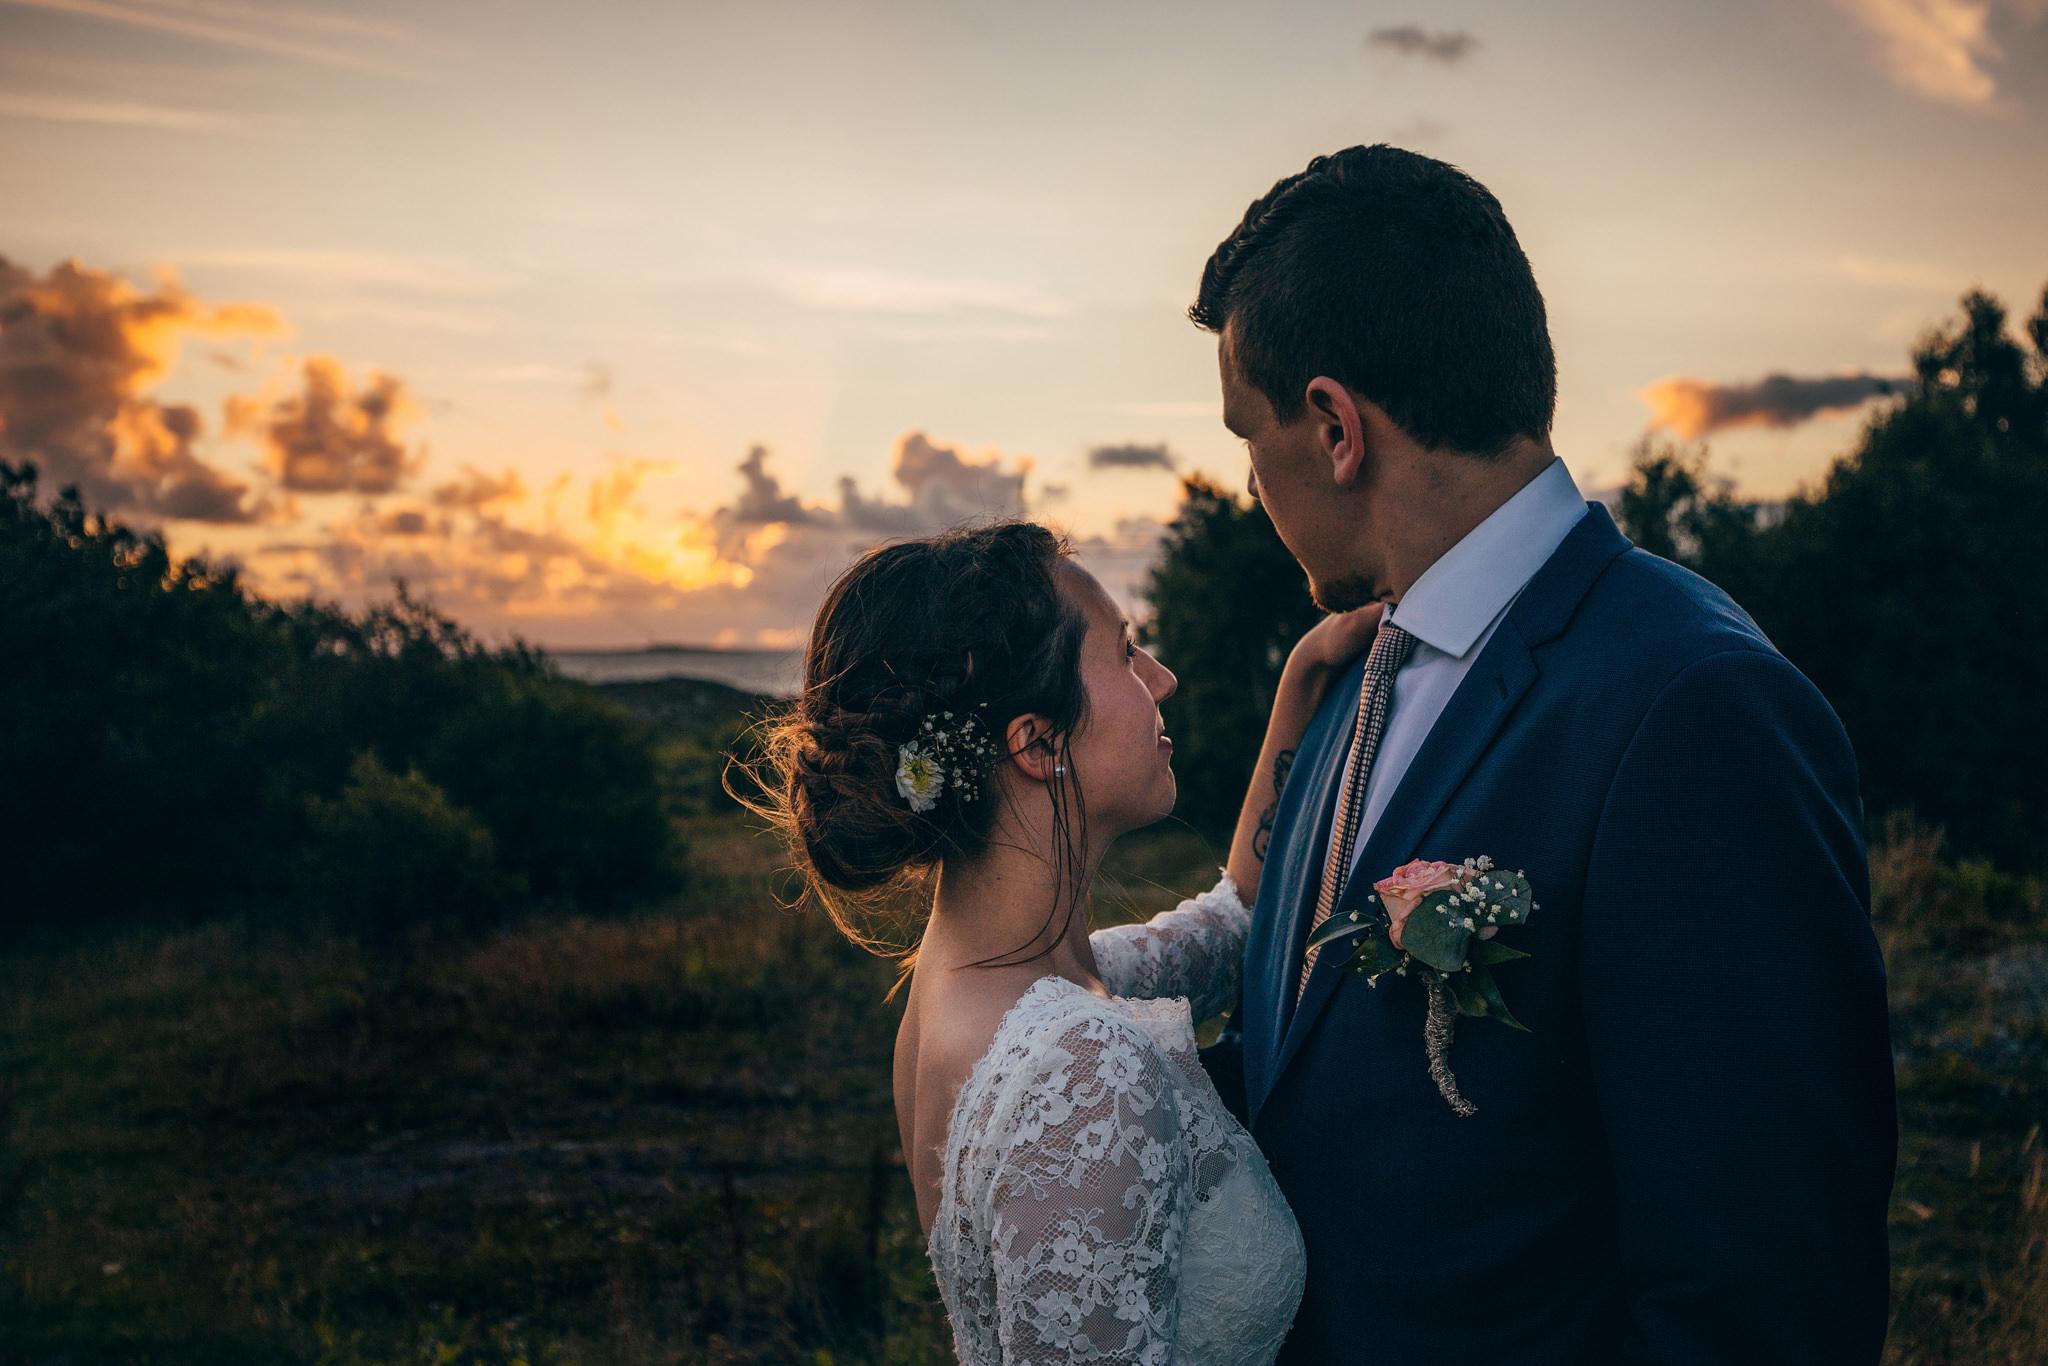 Norway+wedding+photographer+elopement+pre+wedding+Casey+Arneson-126.jpg